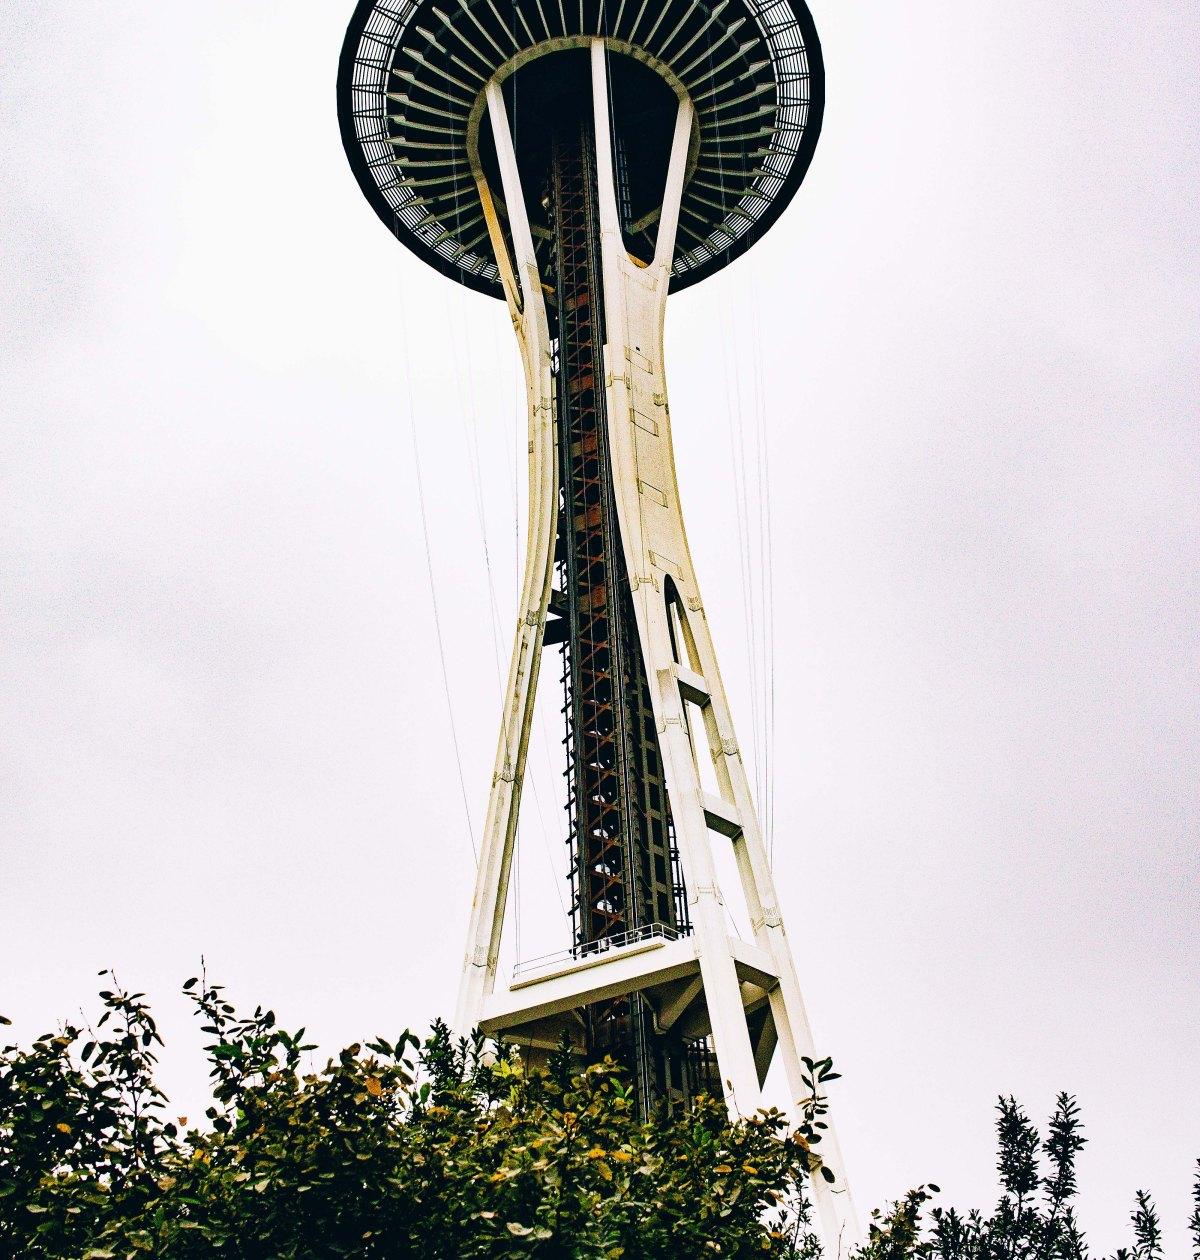 Day In Seattle - www.viciloves.com - @viciloves1